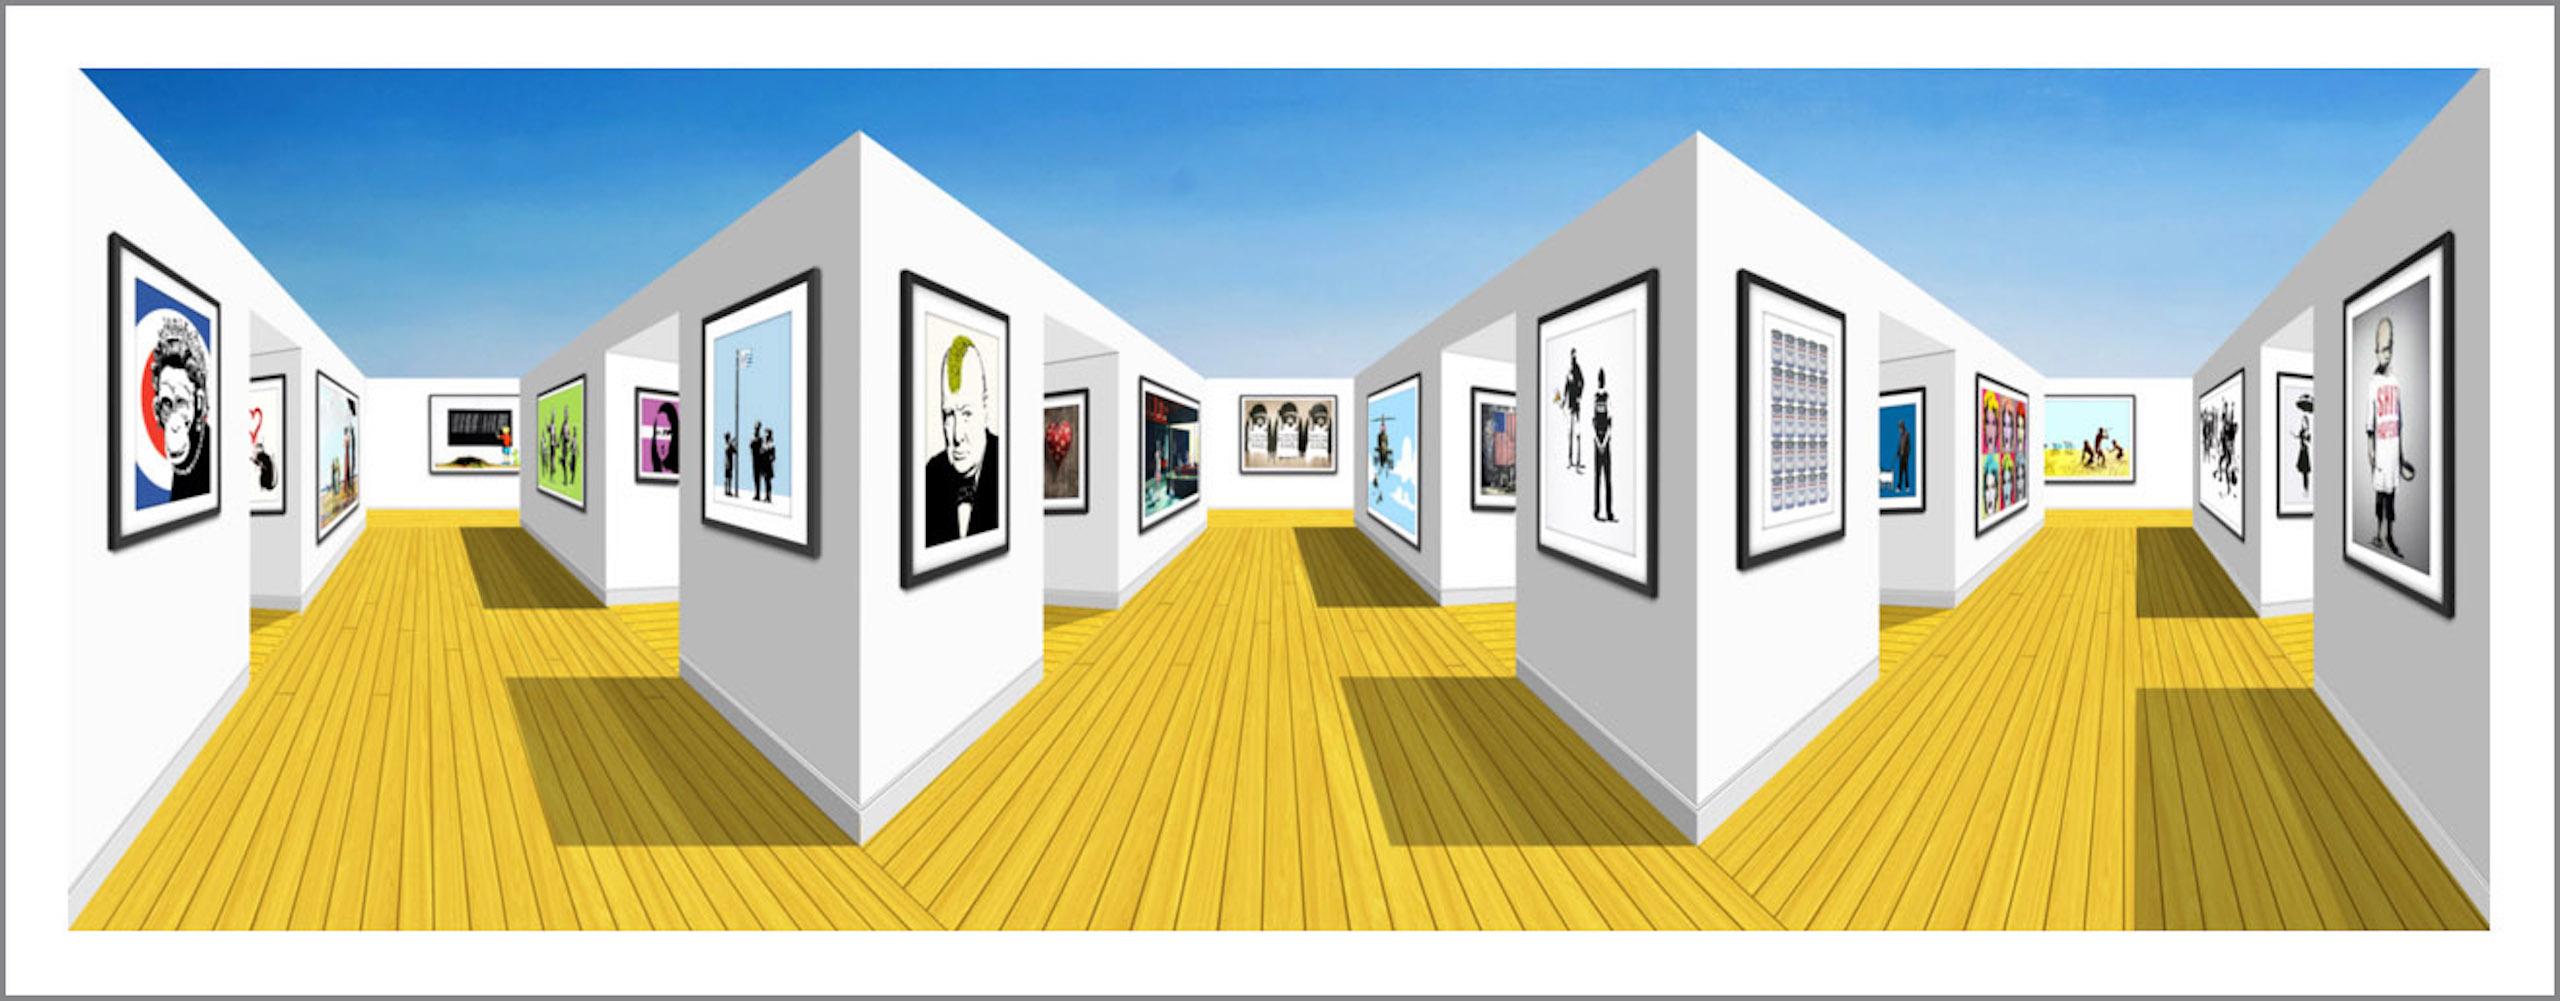 WINSTON (Banksy gallery) (2021)92 x 39 x 19 cm, Mixed media